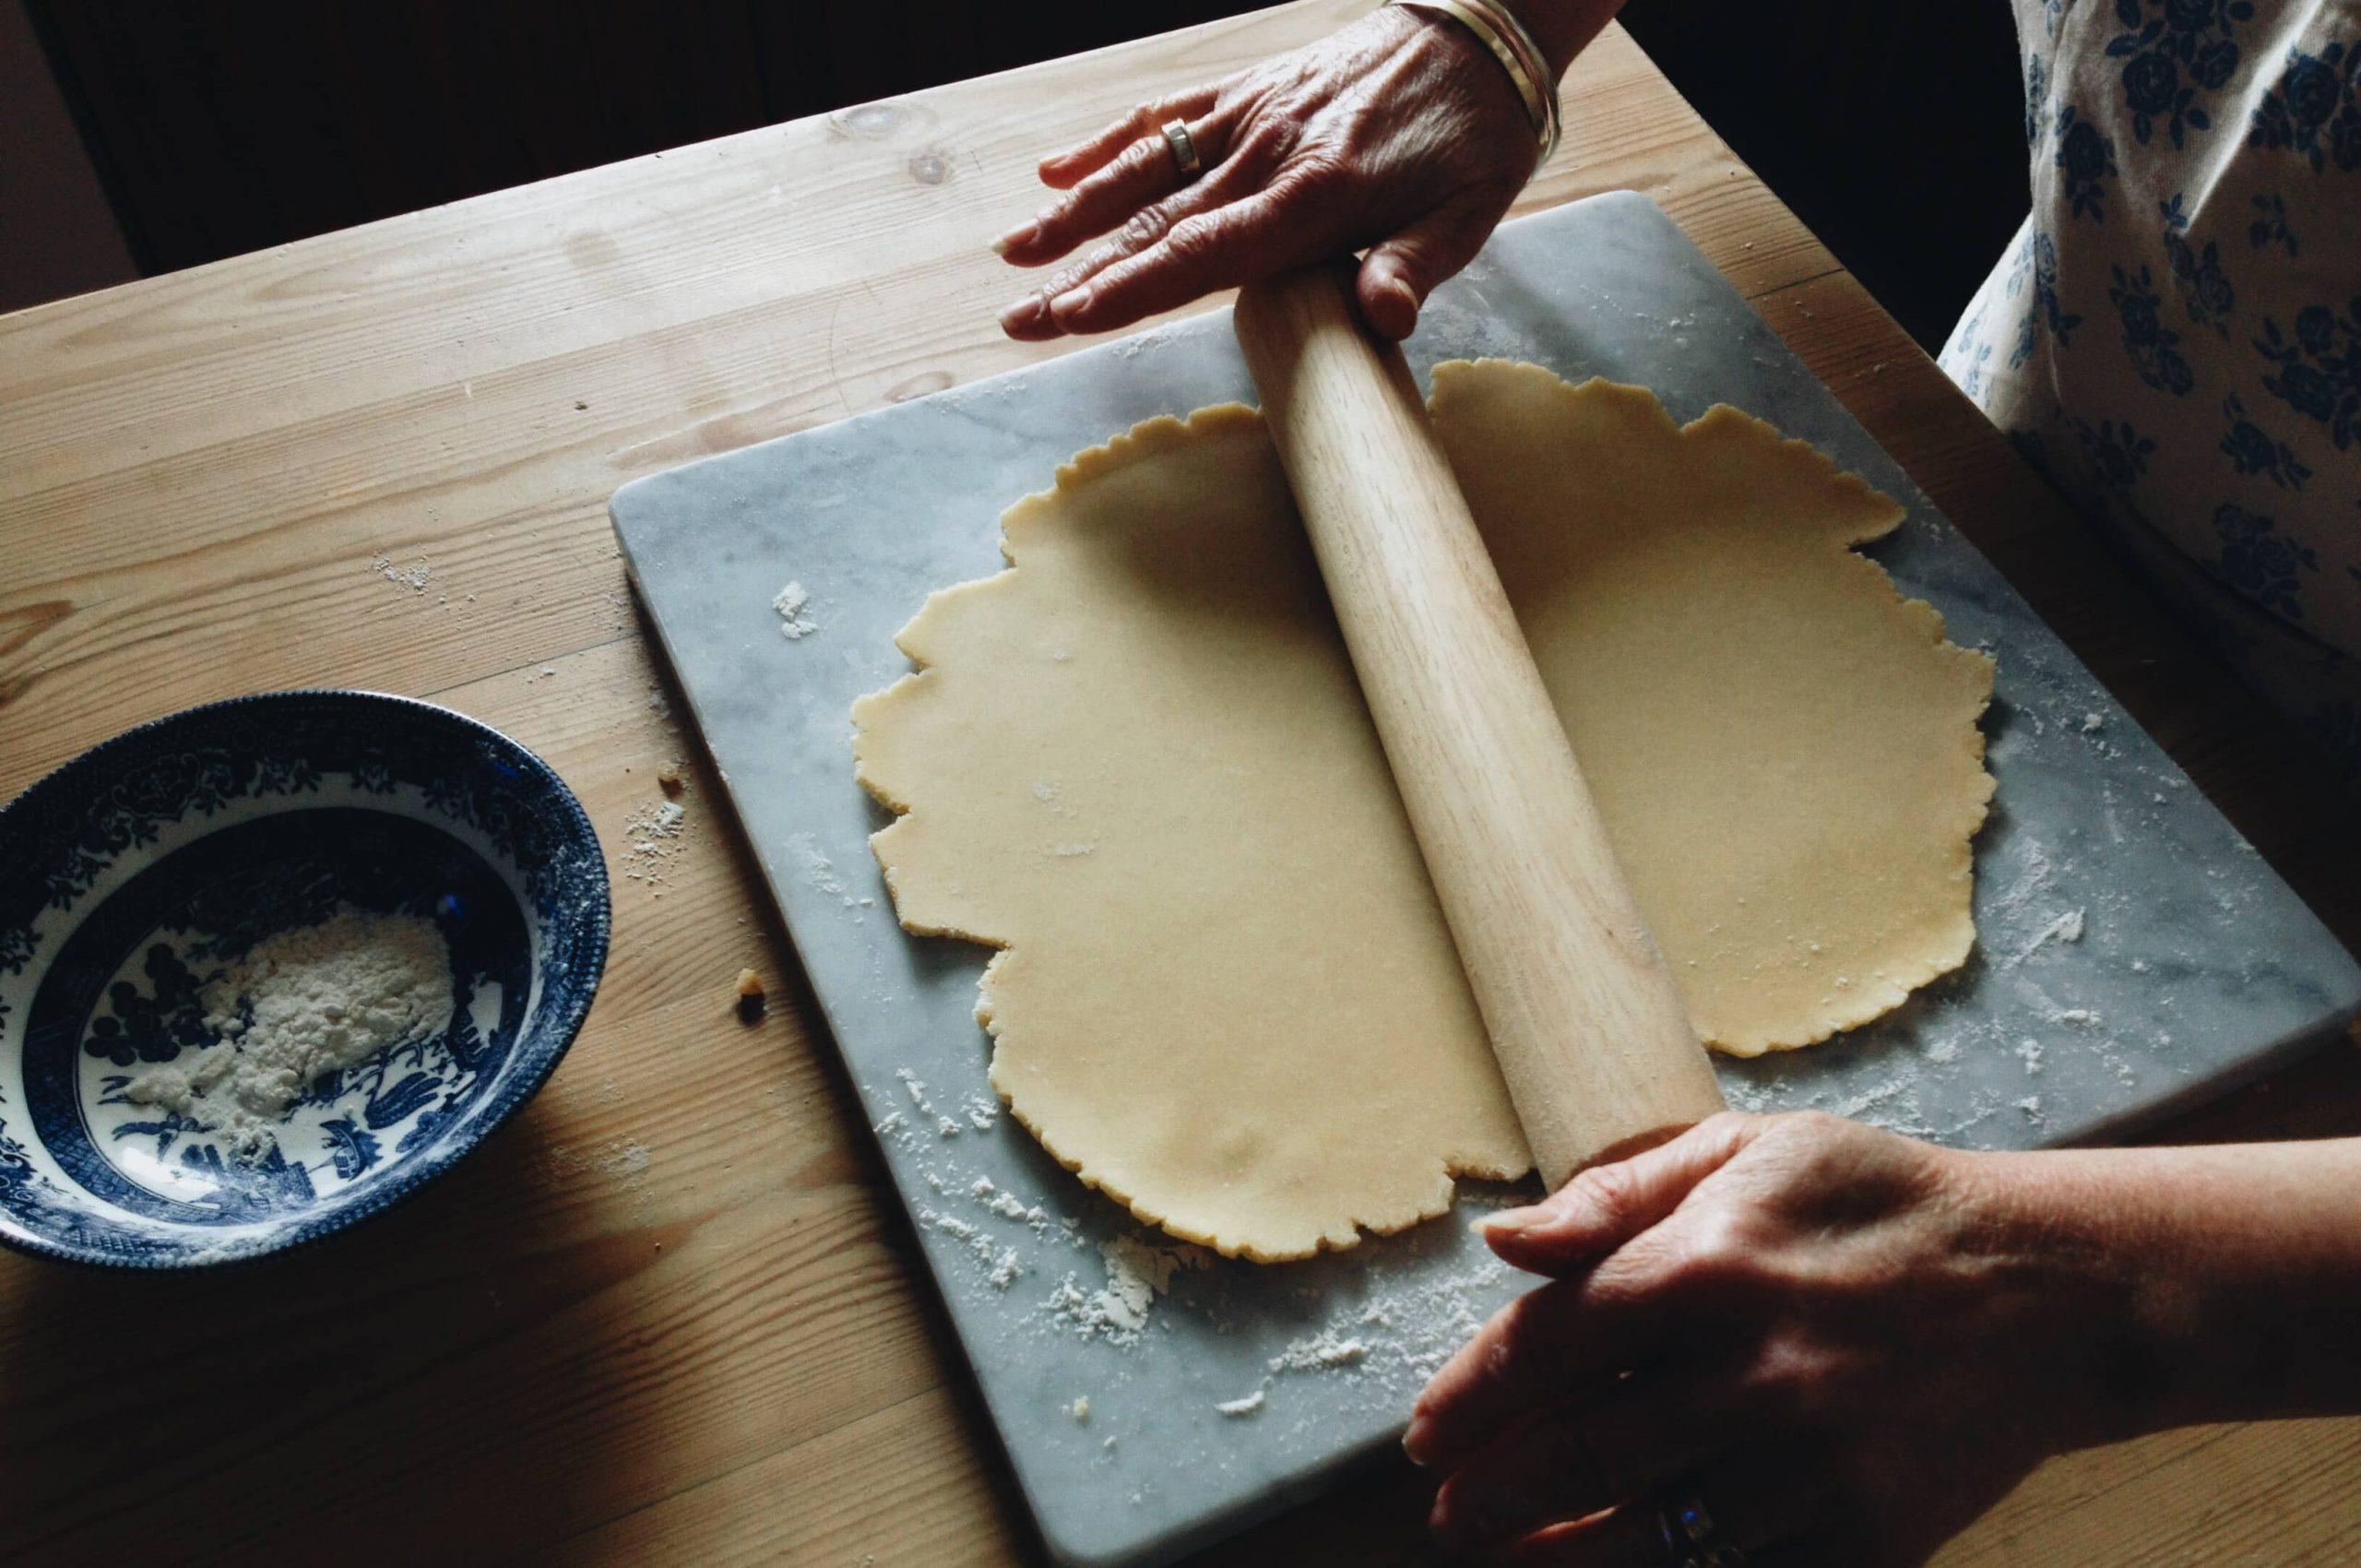 Ateliers de pâtisserie